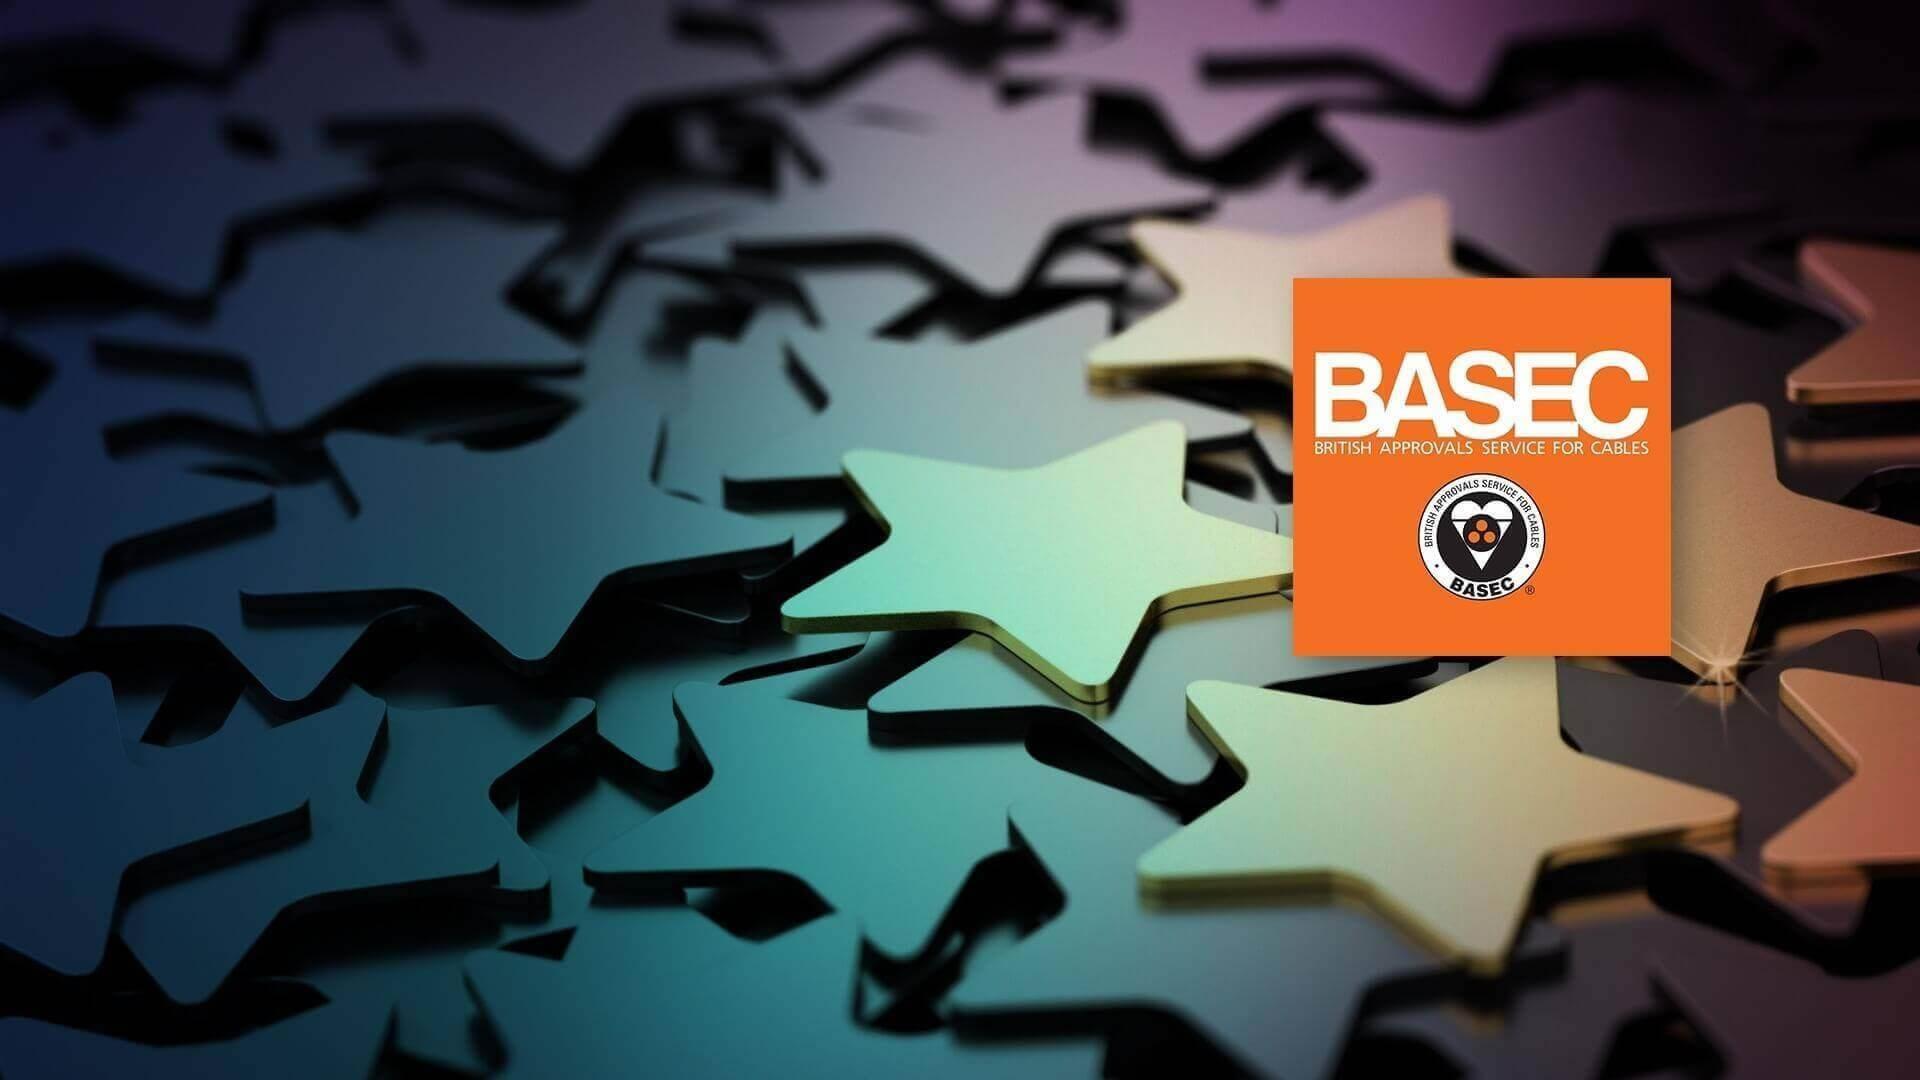 2012'DEN BERİ <br/>BASEC SERTİFİKALI KABLOLAR